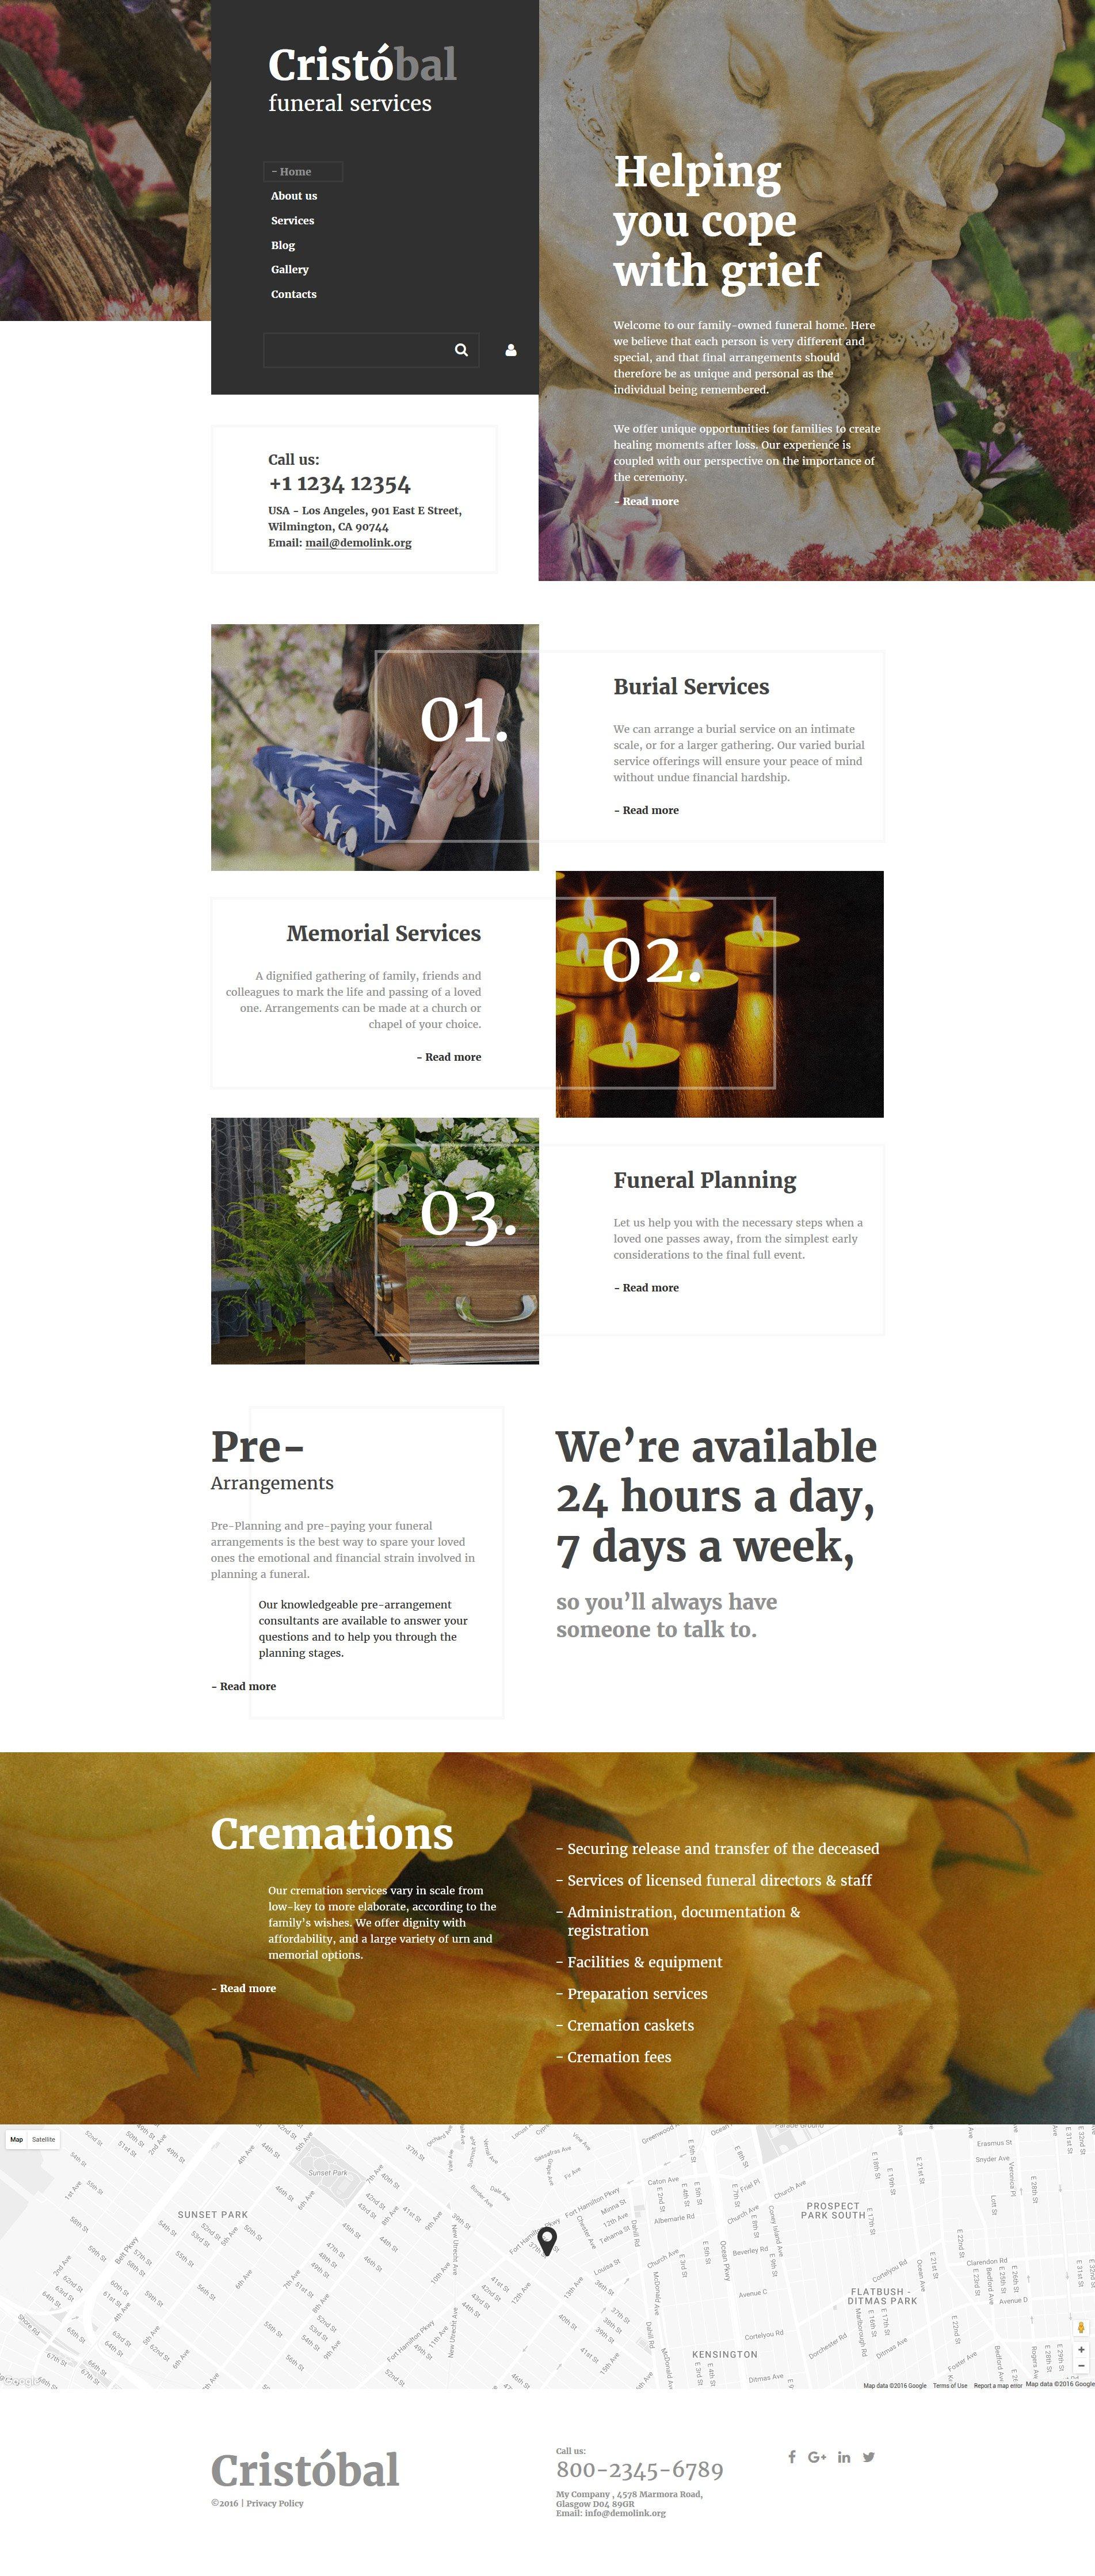 Cristobal - Funeral Services Responsive Website Template